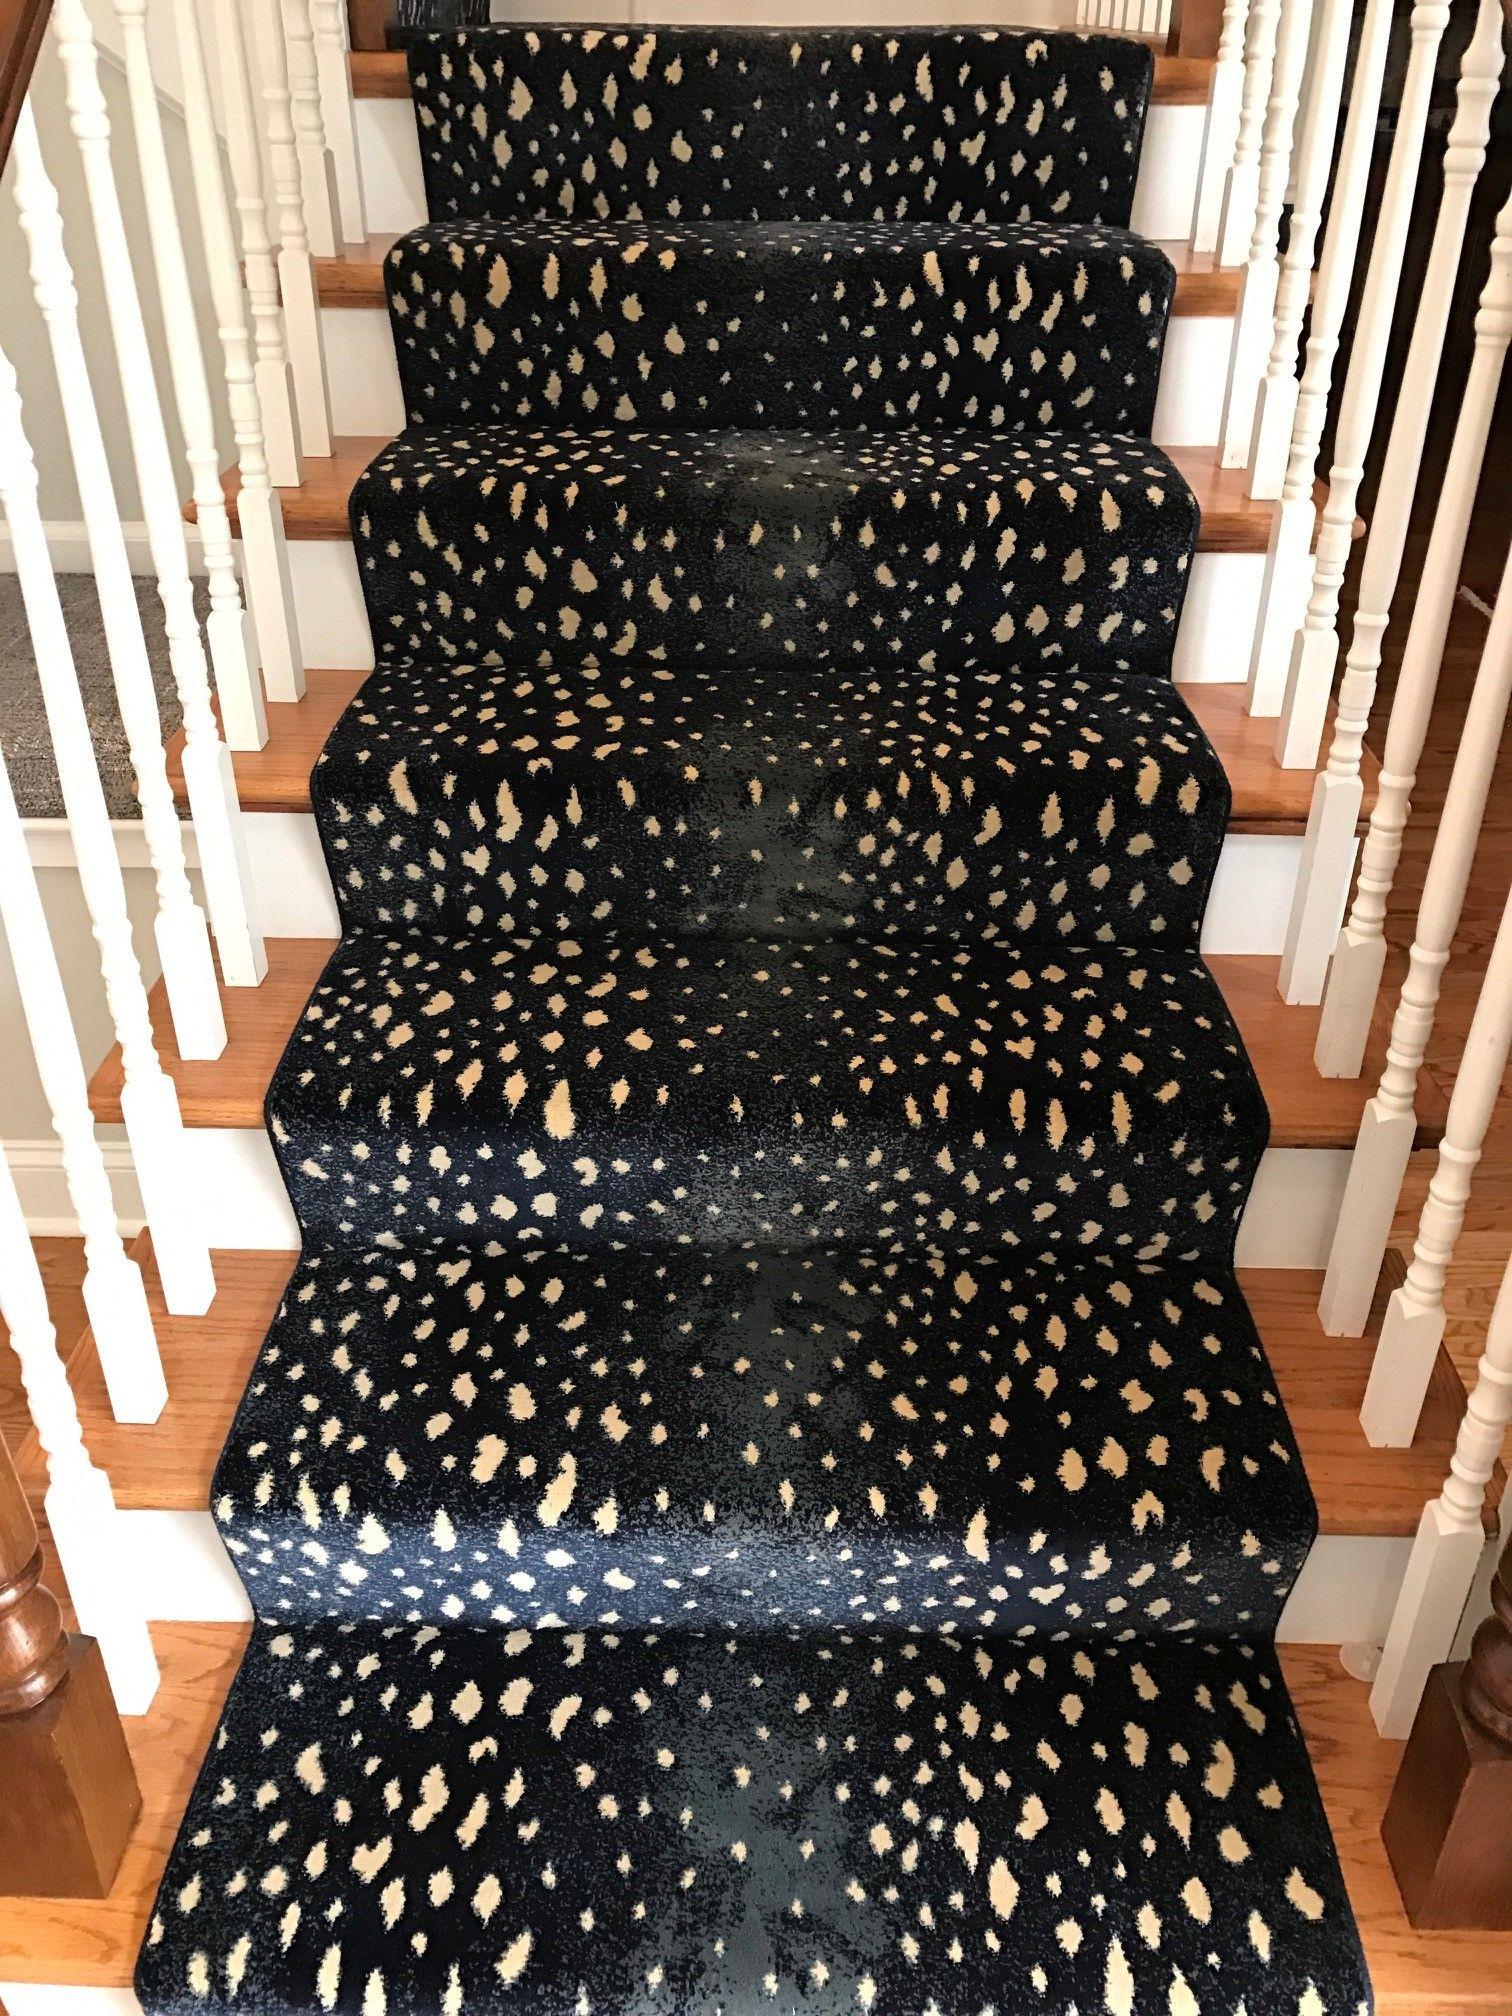 Patterned Stair Runner Staircase Animal Print Carpet Wood Newel Posts Carpet Stairs Prestige S Carpet Stairs